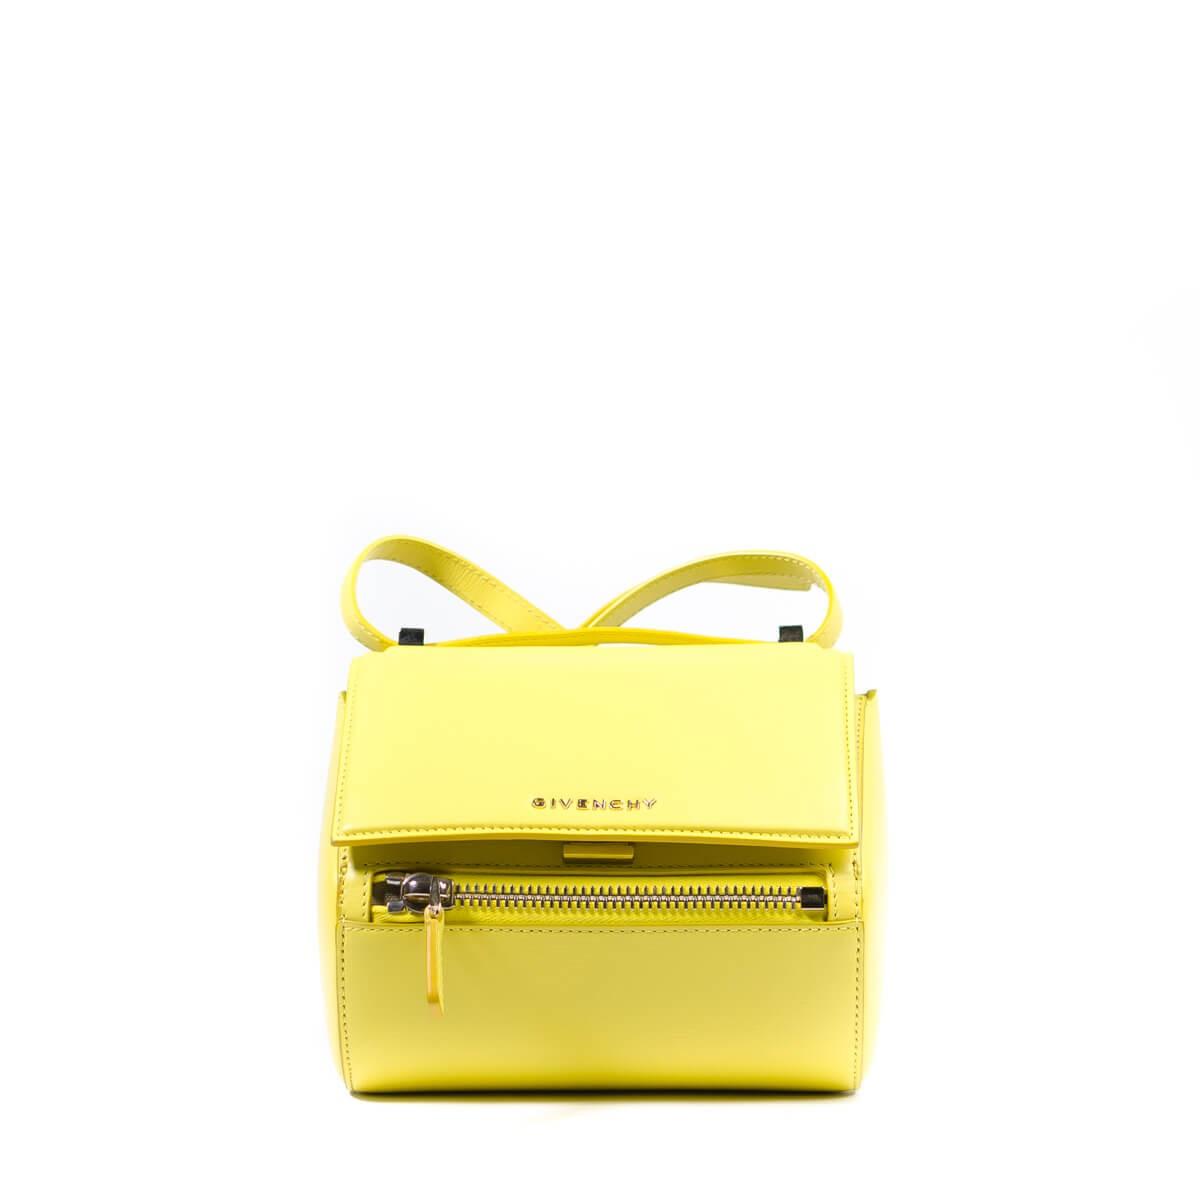 Pandora Box Mini W Light Gold Hardware Yellow Leather Cross Body Bag 8dd7476923765